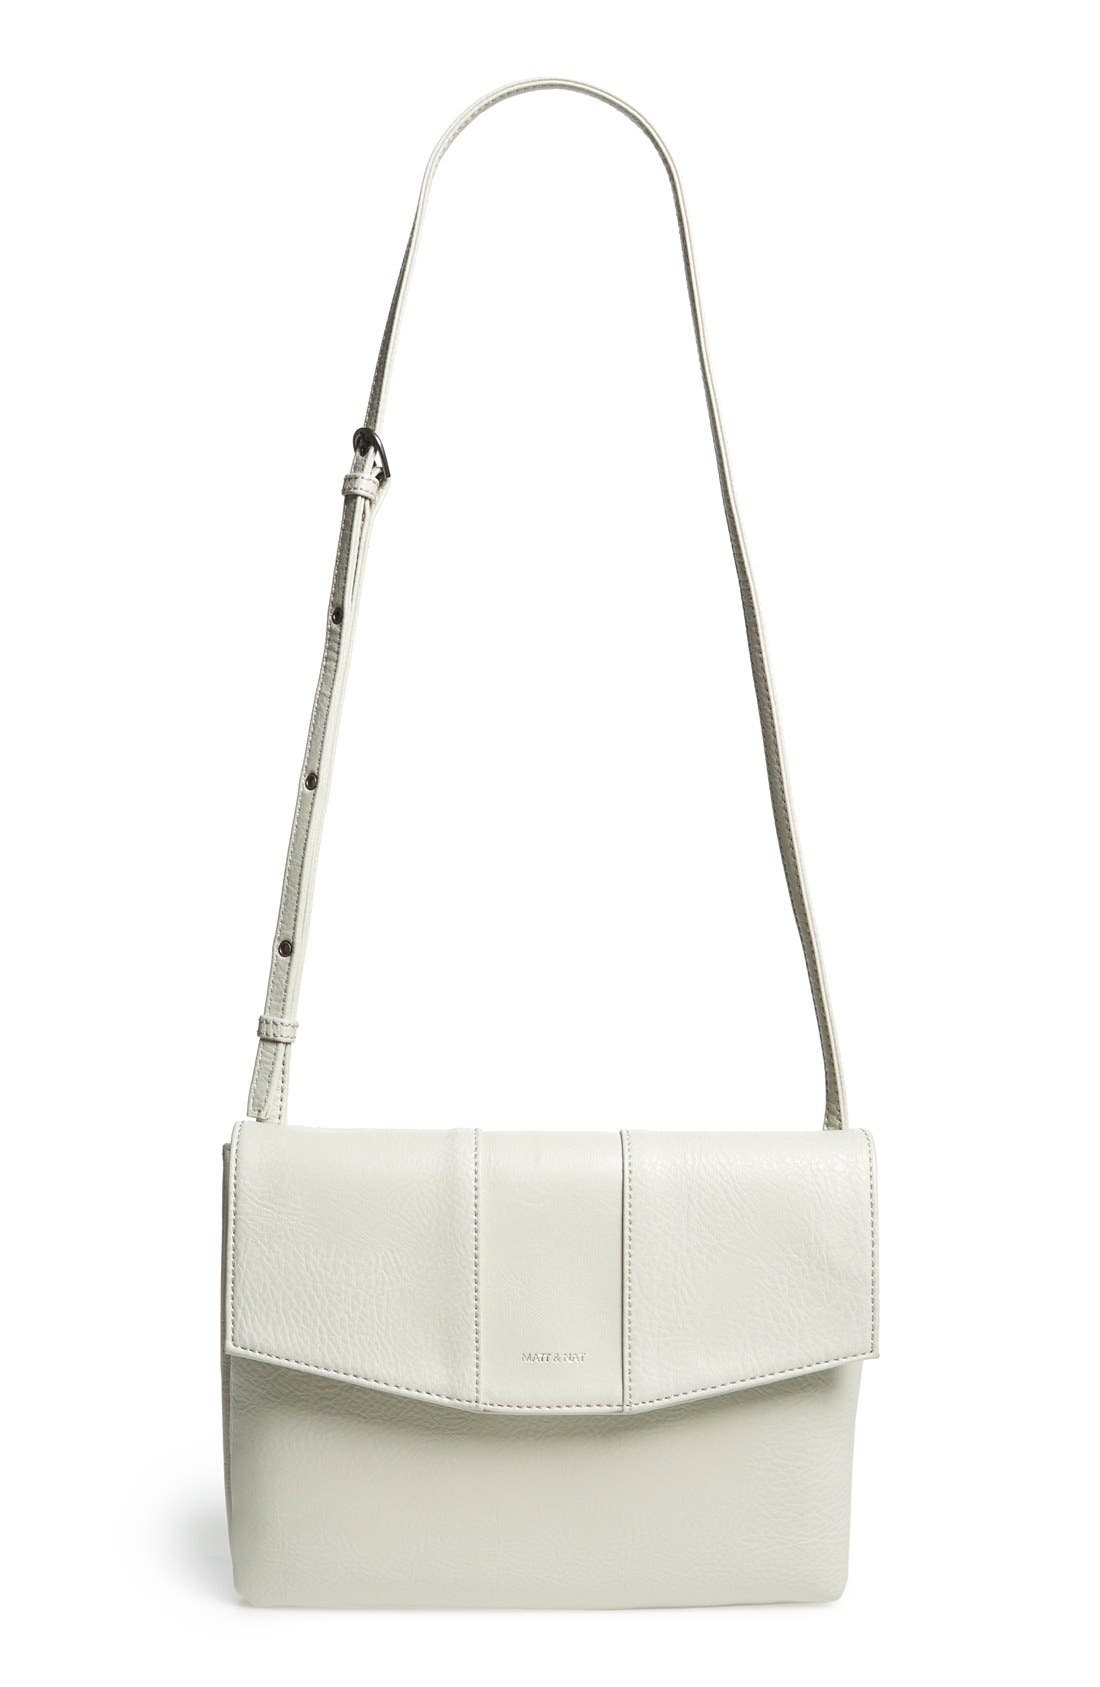 Alternate Image 1 Selected - Matt & Nat 'Eeha' Vegan Leather Crossbody Bag